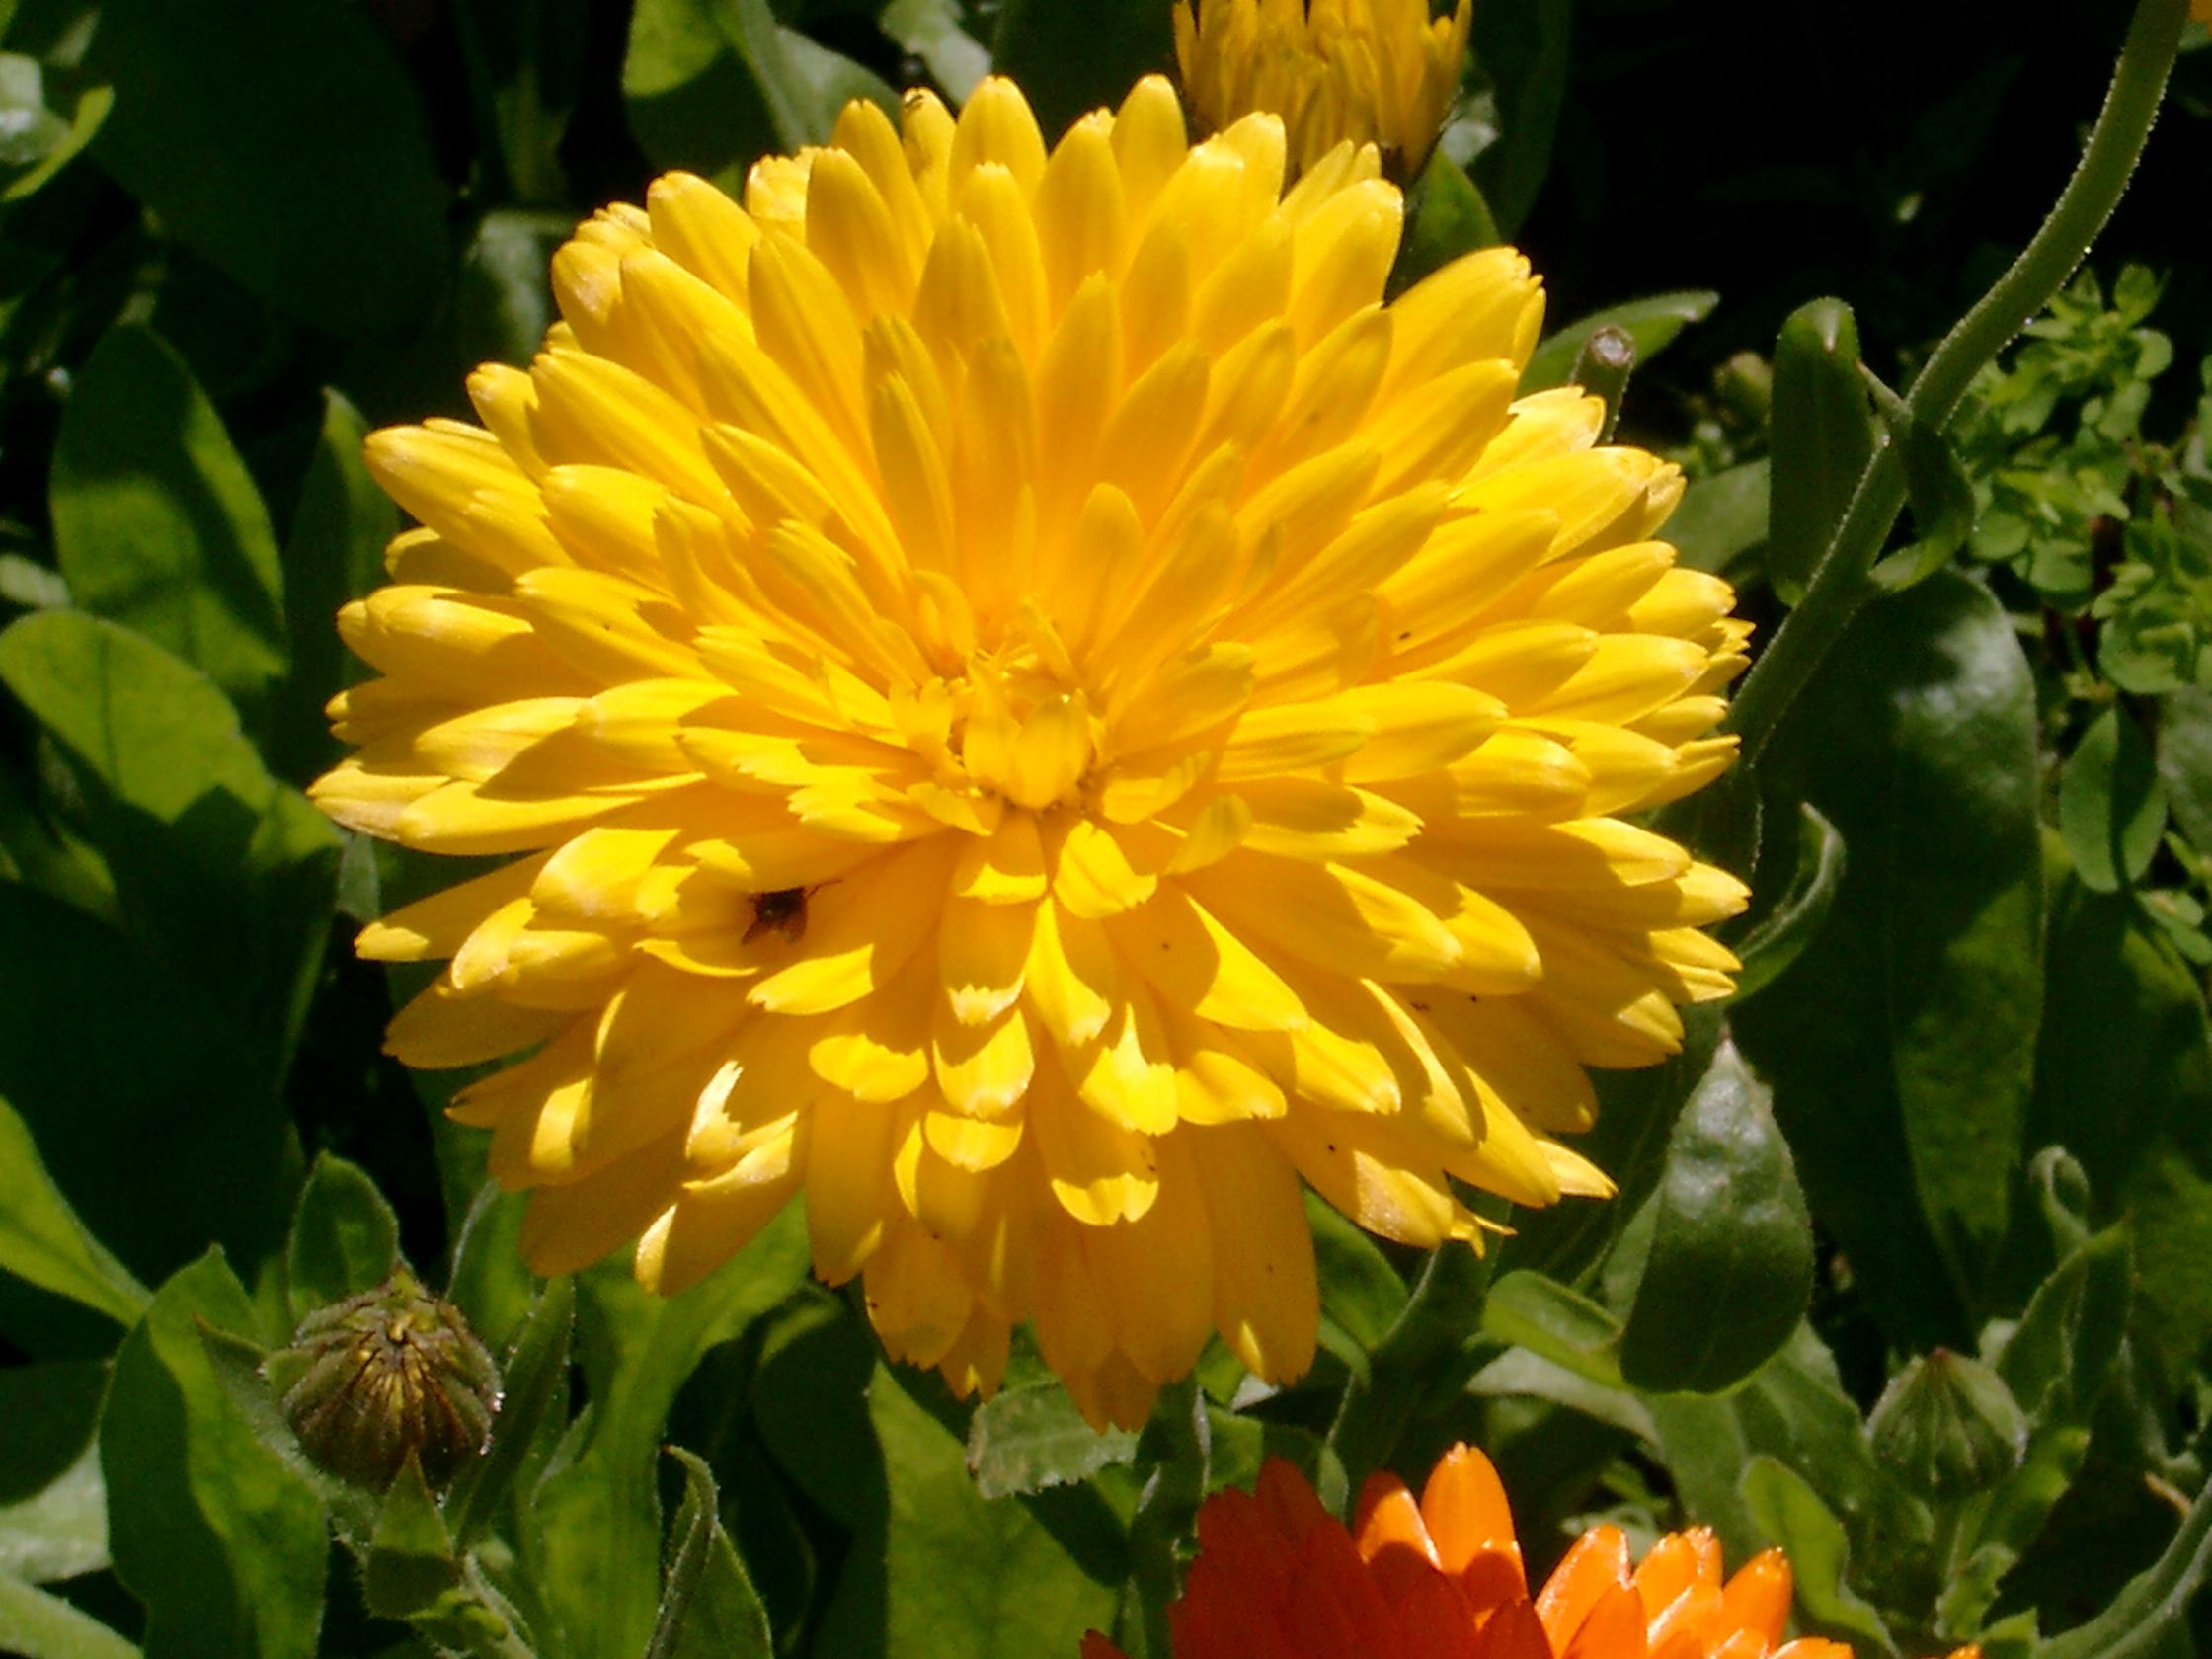 Filebenkid77 big yellow flower 070807g wikimedia commons filebenkid77 big yellow flower 070807g mightylinksfo